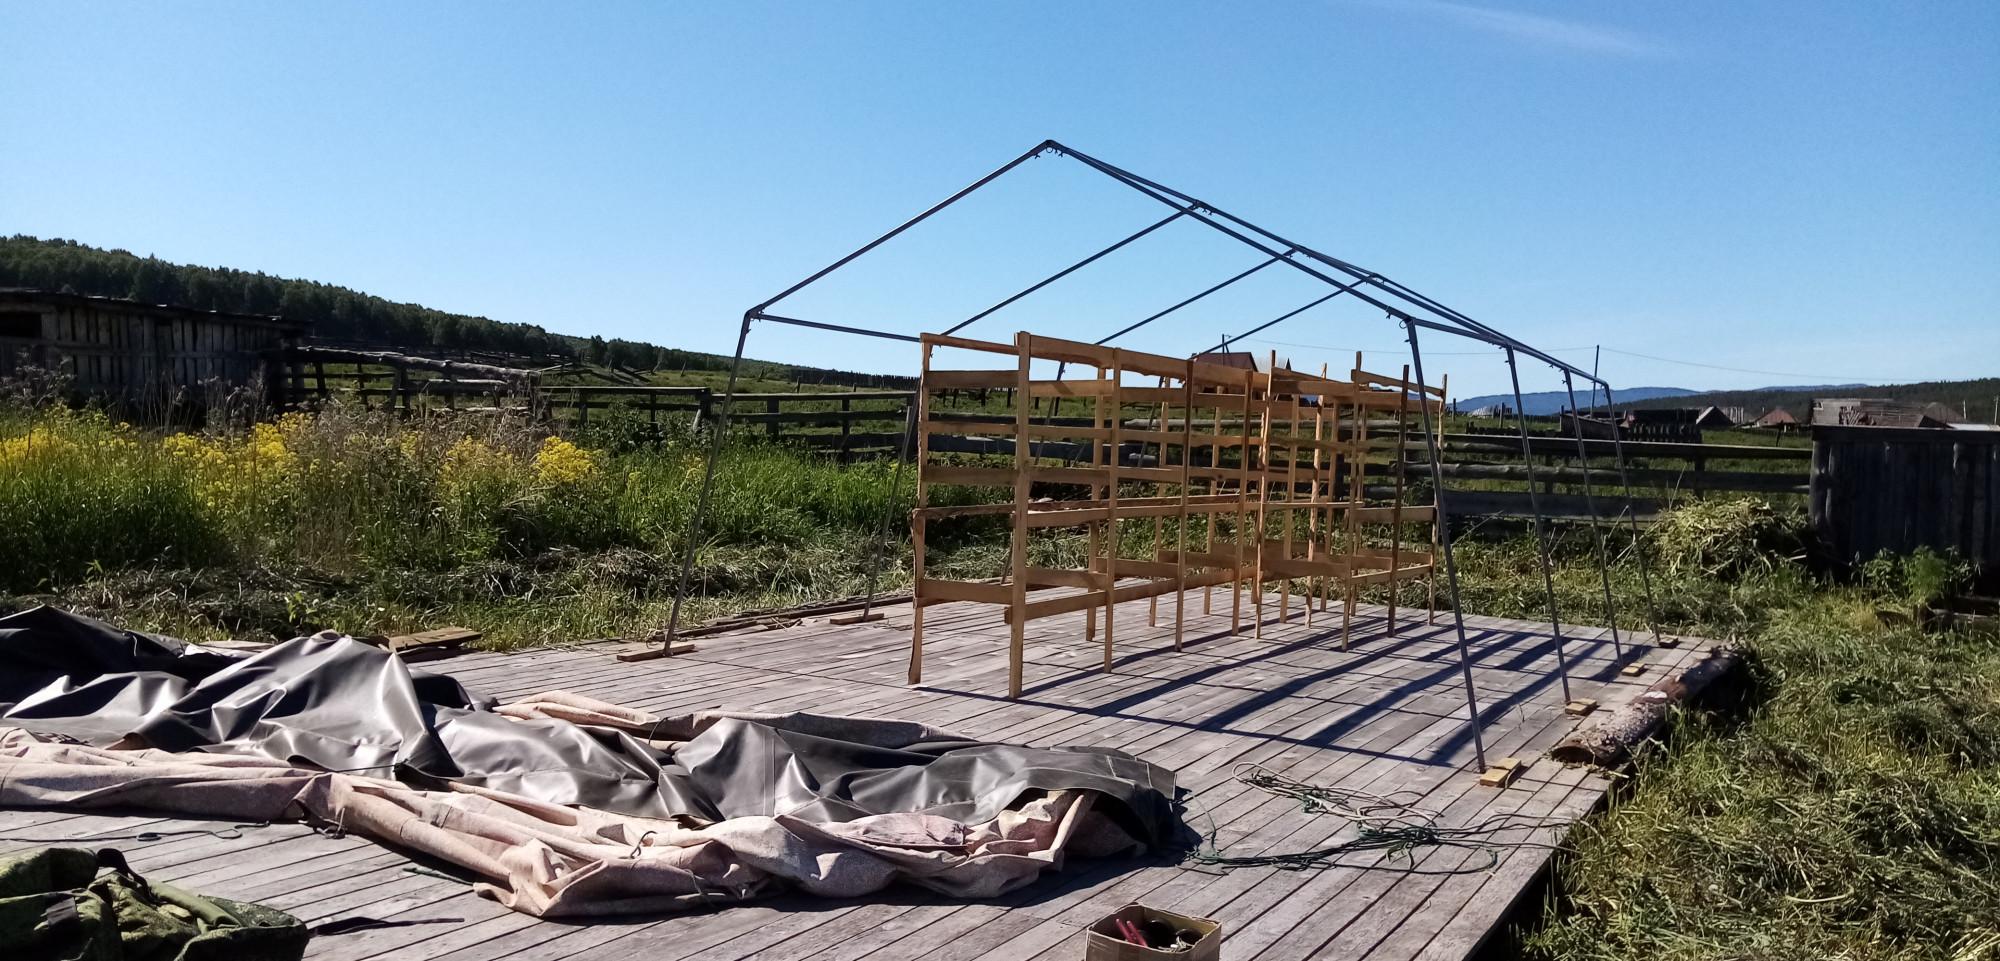 Каркас помещения для сушки трав